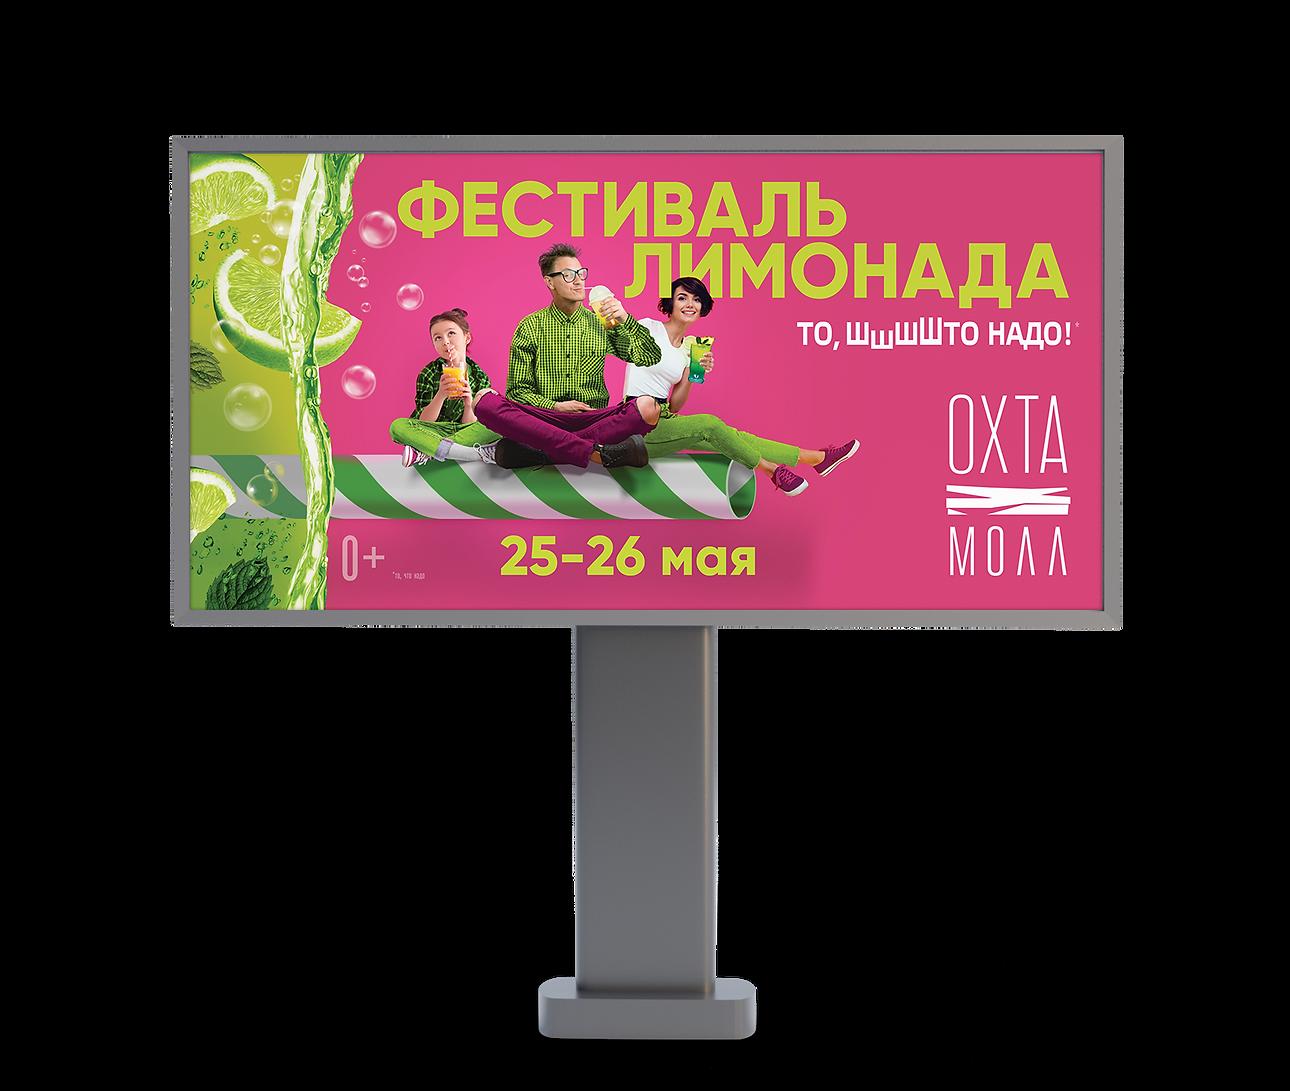 Kollegi CA. Охта Молл реклама Фестиваль Лимонада